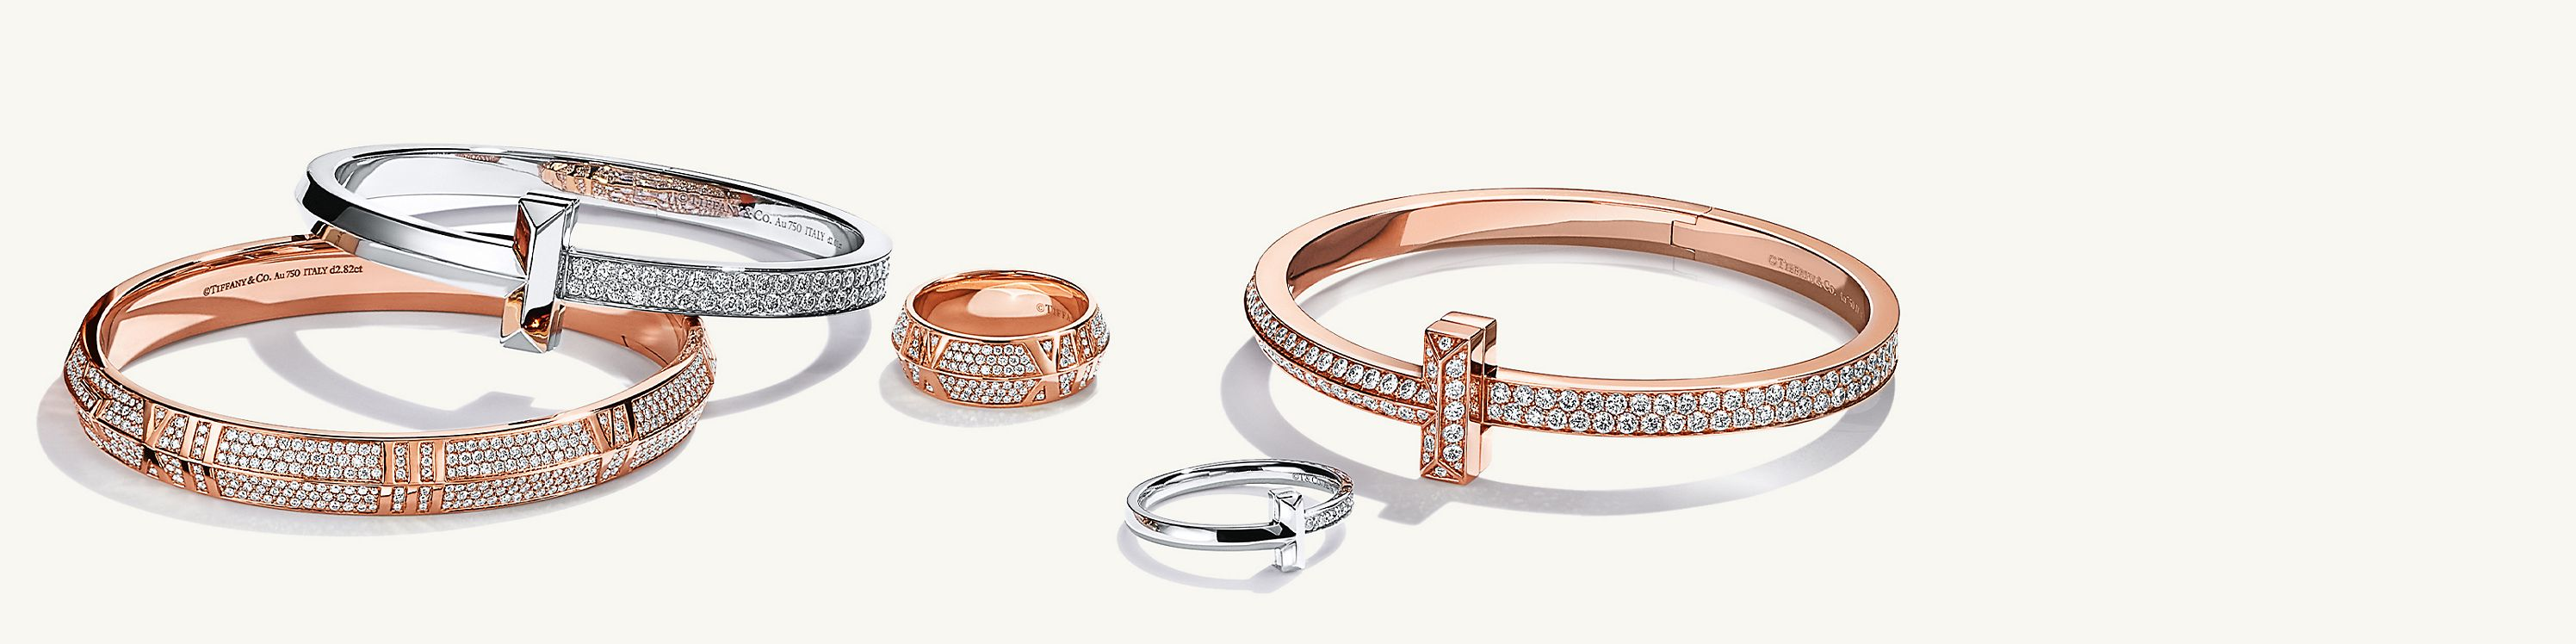 Shop New Tiffany & Co. Jewelry